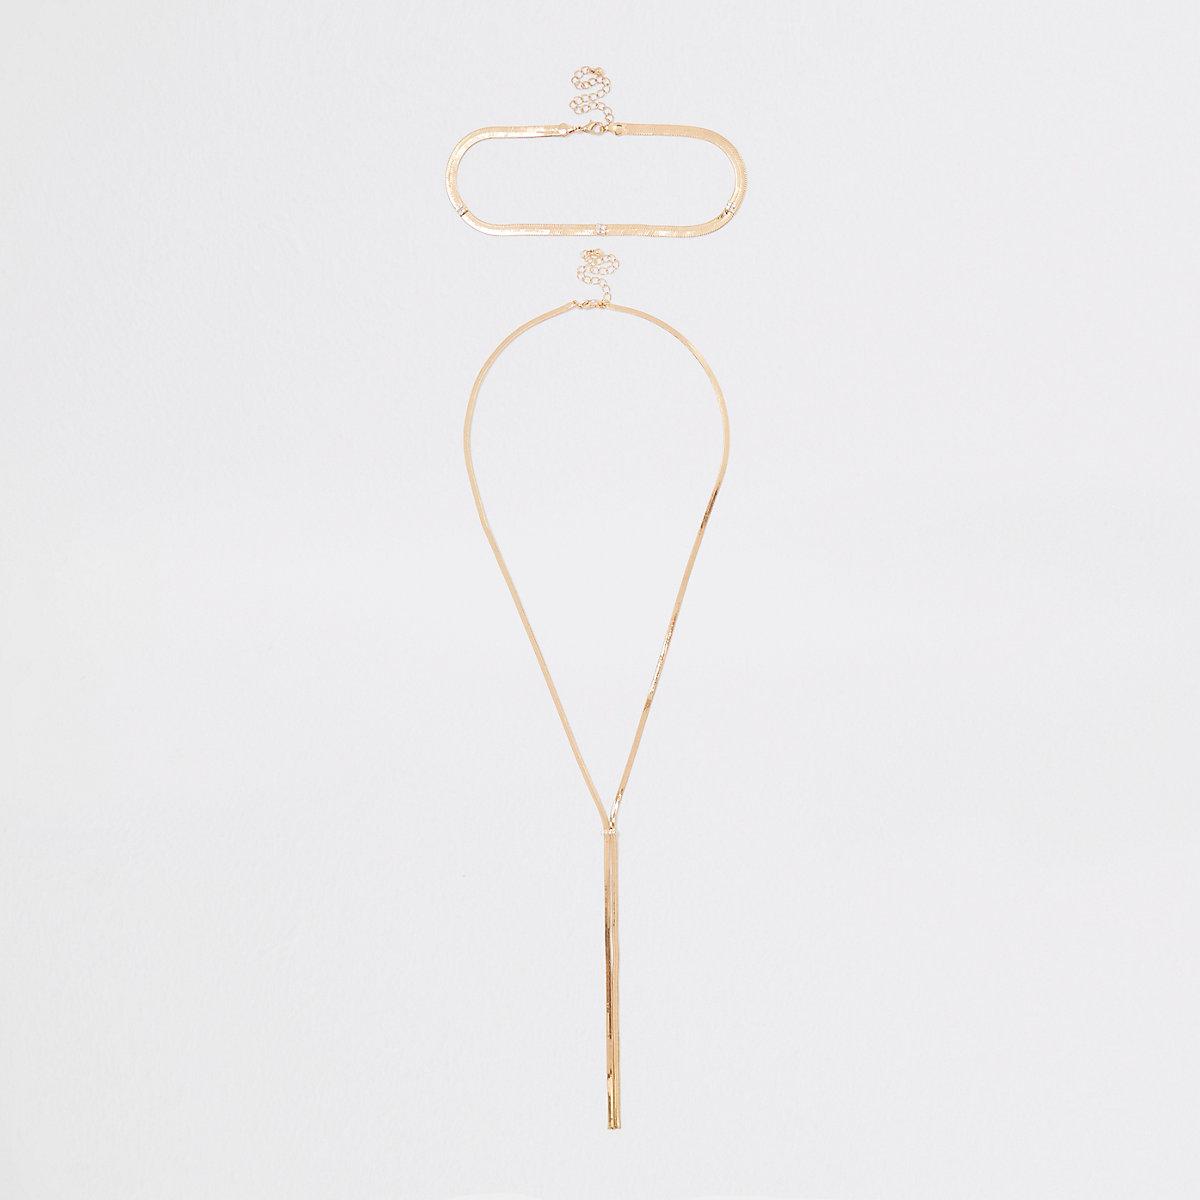 Gold tone interlinked necklace set